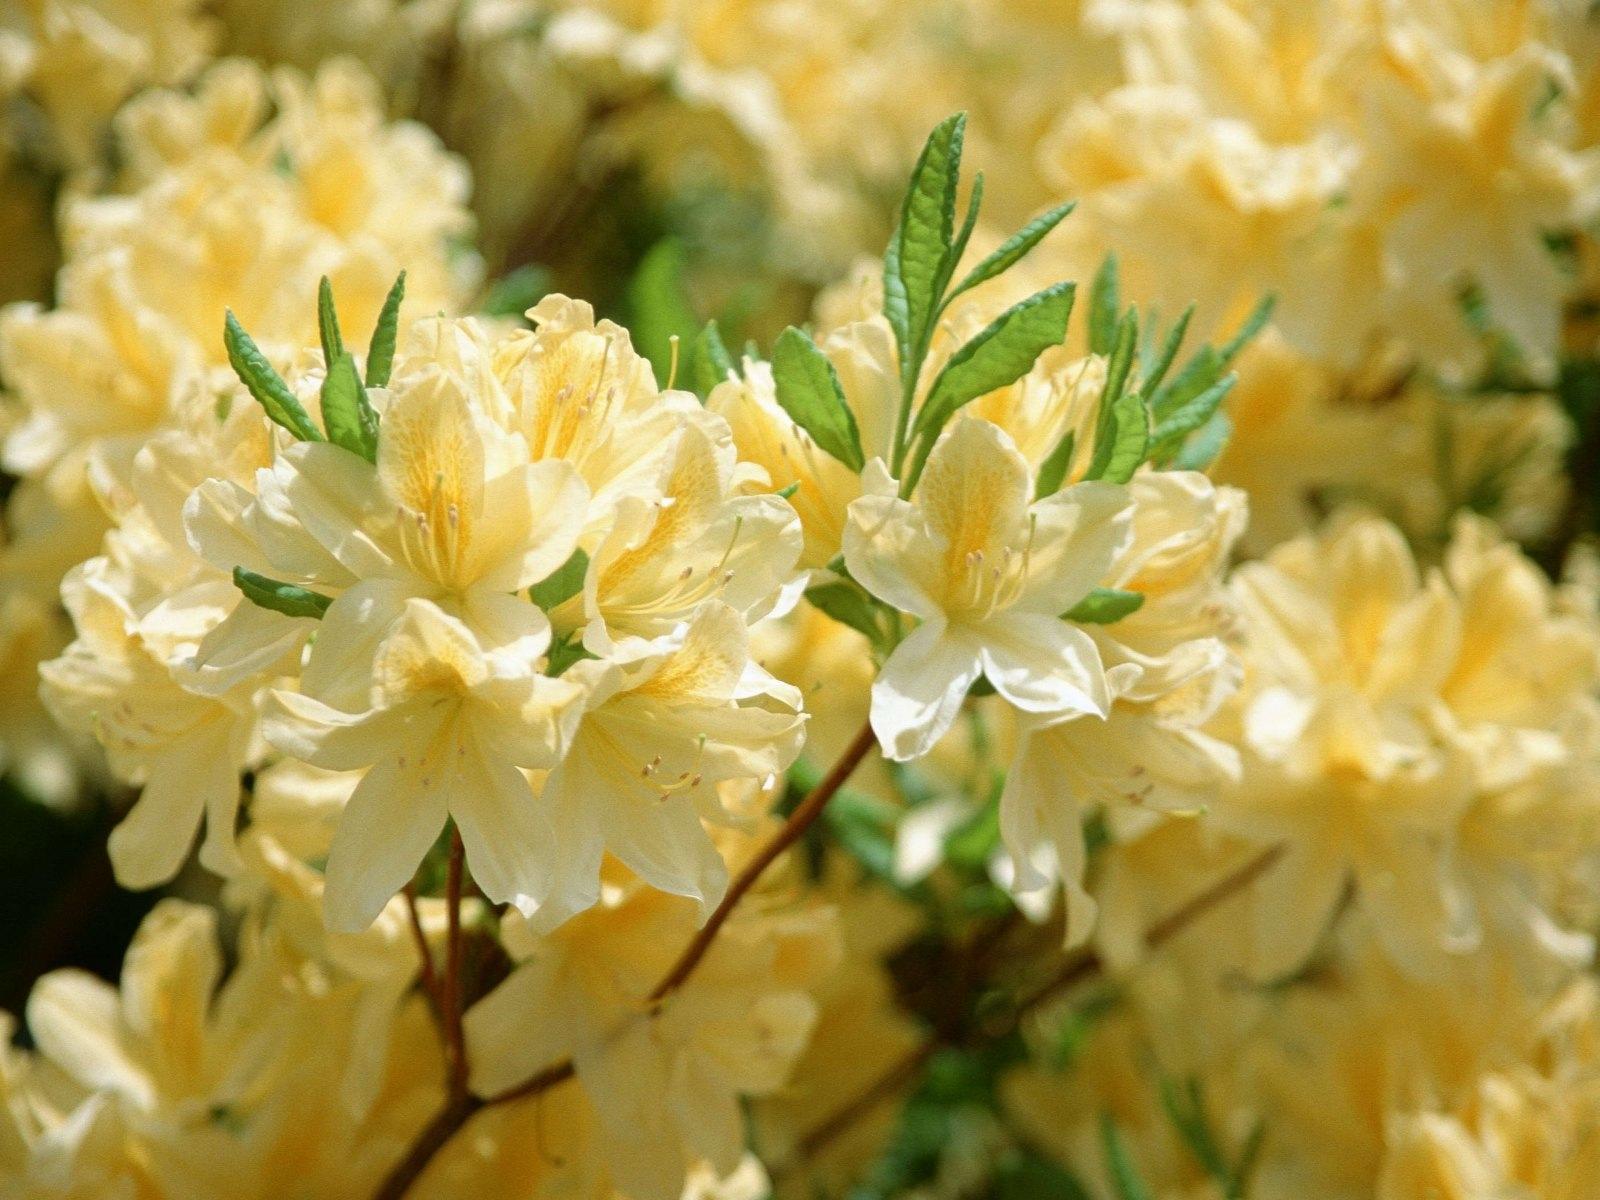 Желтый распустившийся цветок  № 731701 бесплатно